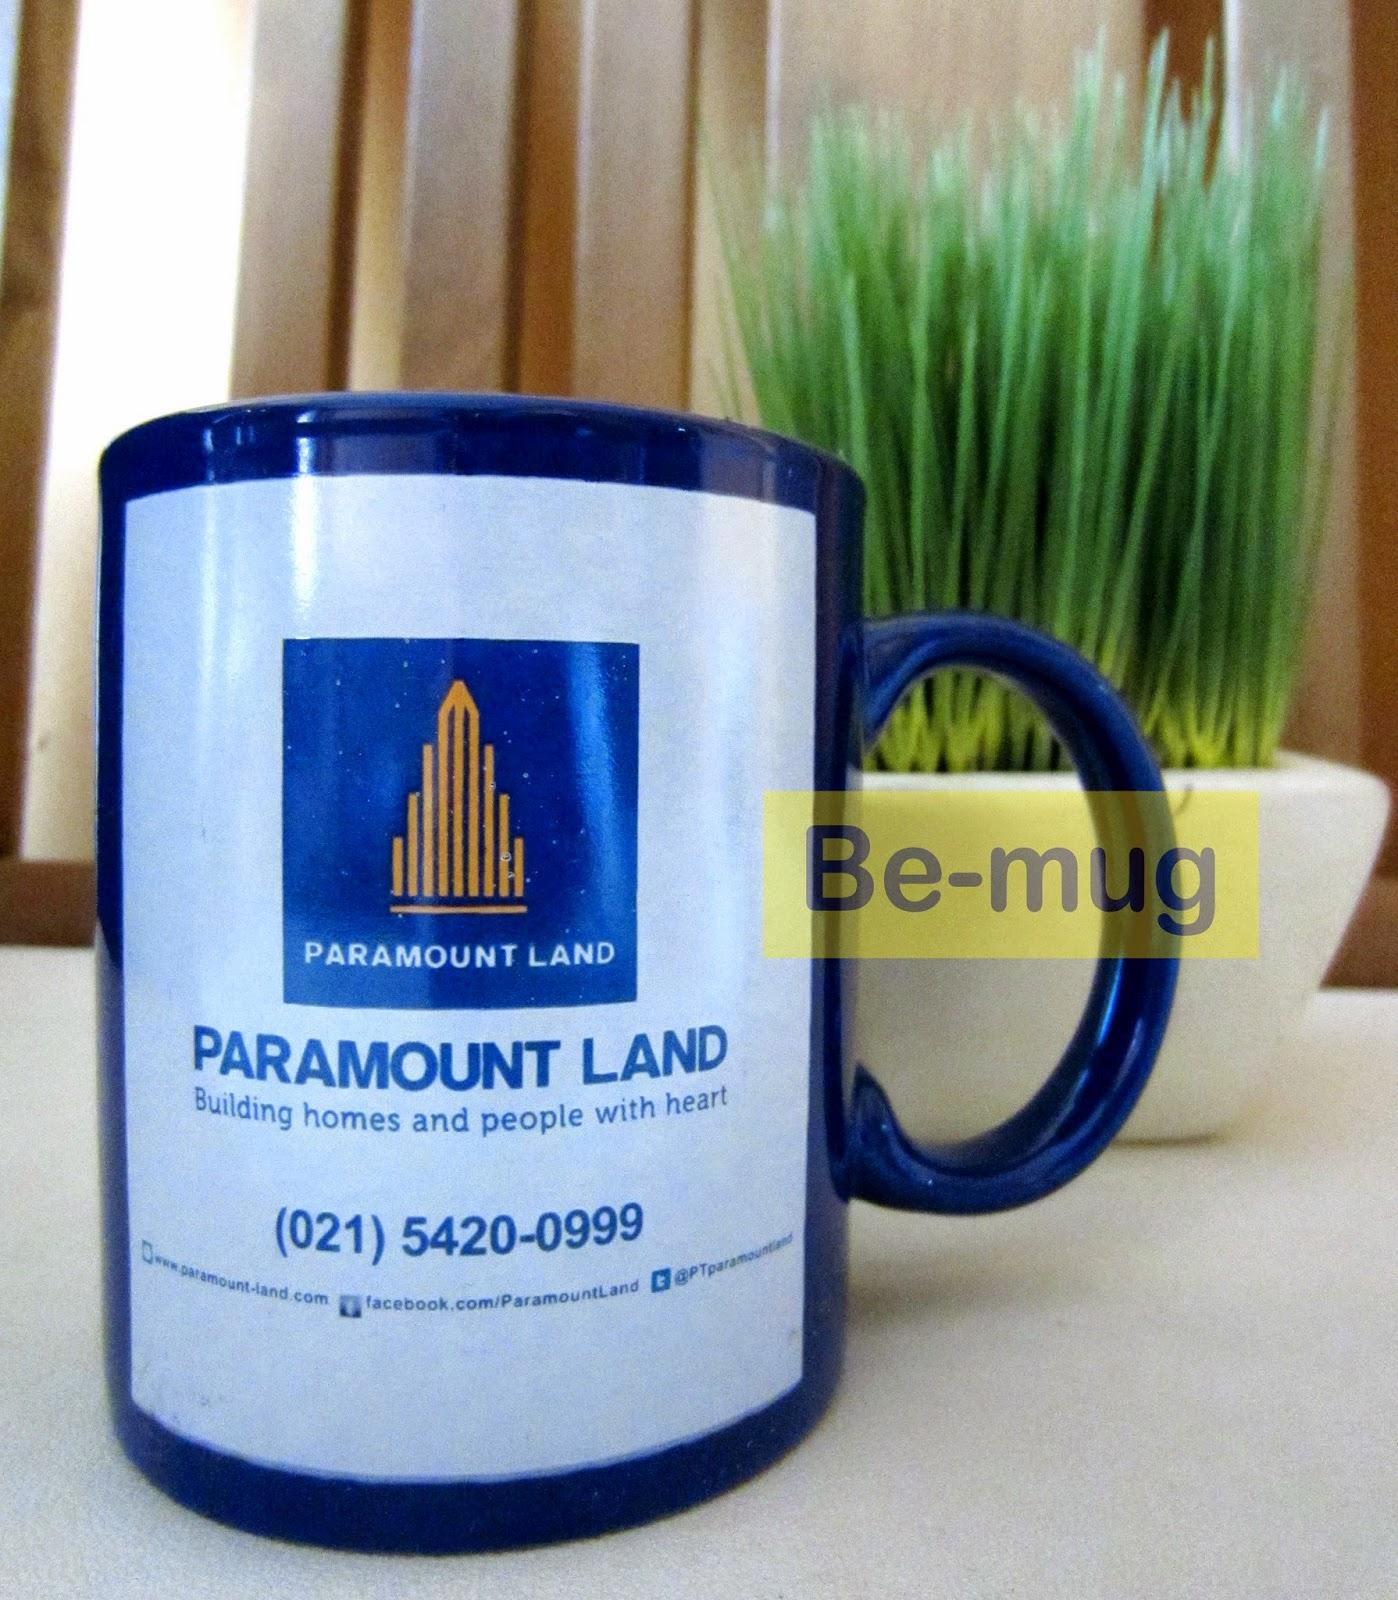 Produk Client Paramount Land